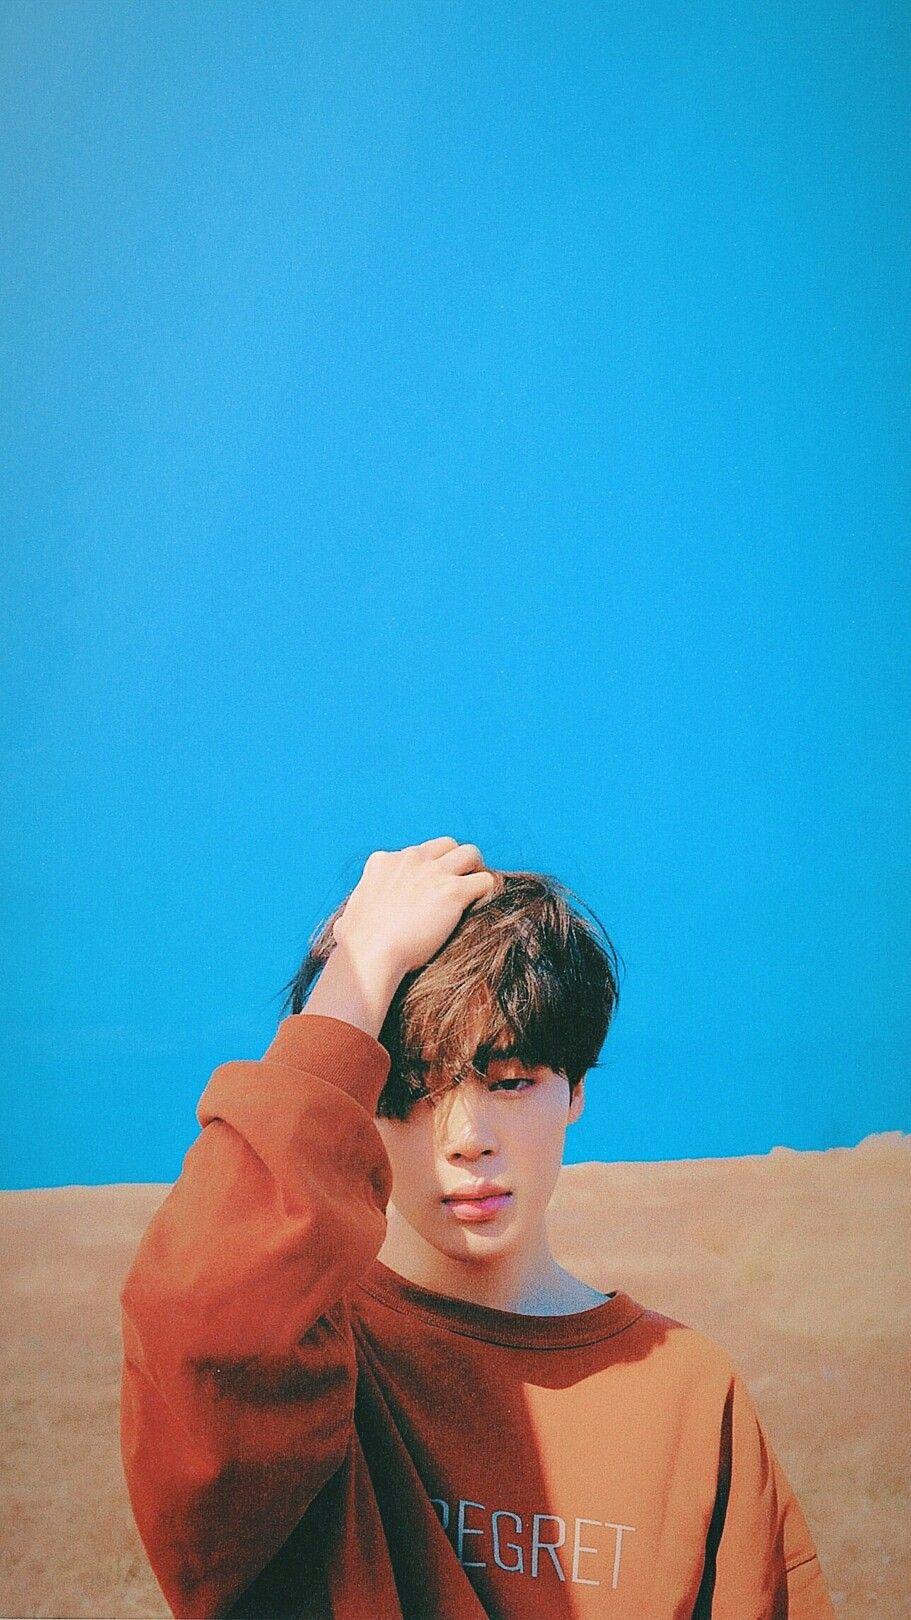 Bts Wallpaper Bts Edits Love Yourself Tear Pls Make Sure To Follow Me Before U Save It Find More On My Account Bts Park Jimin Bts Bts Jimin Jimin